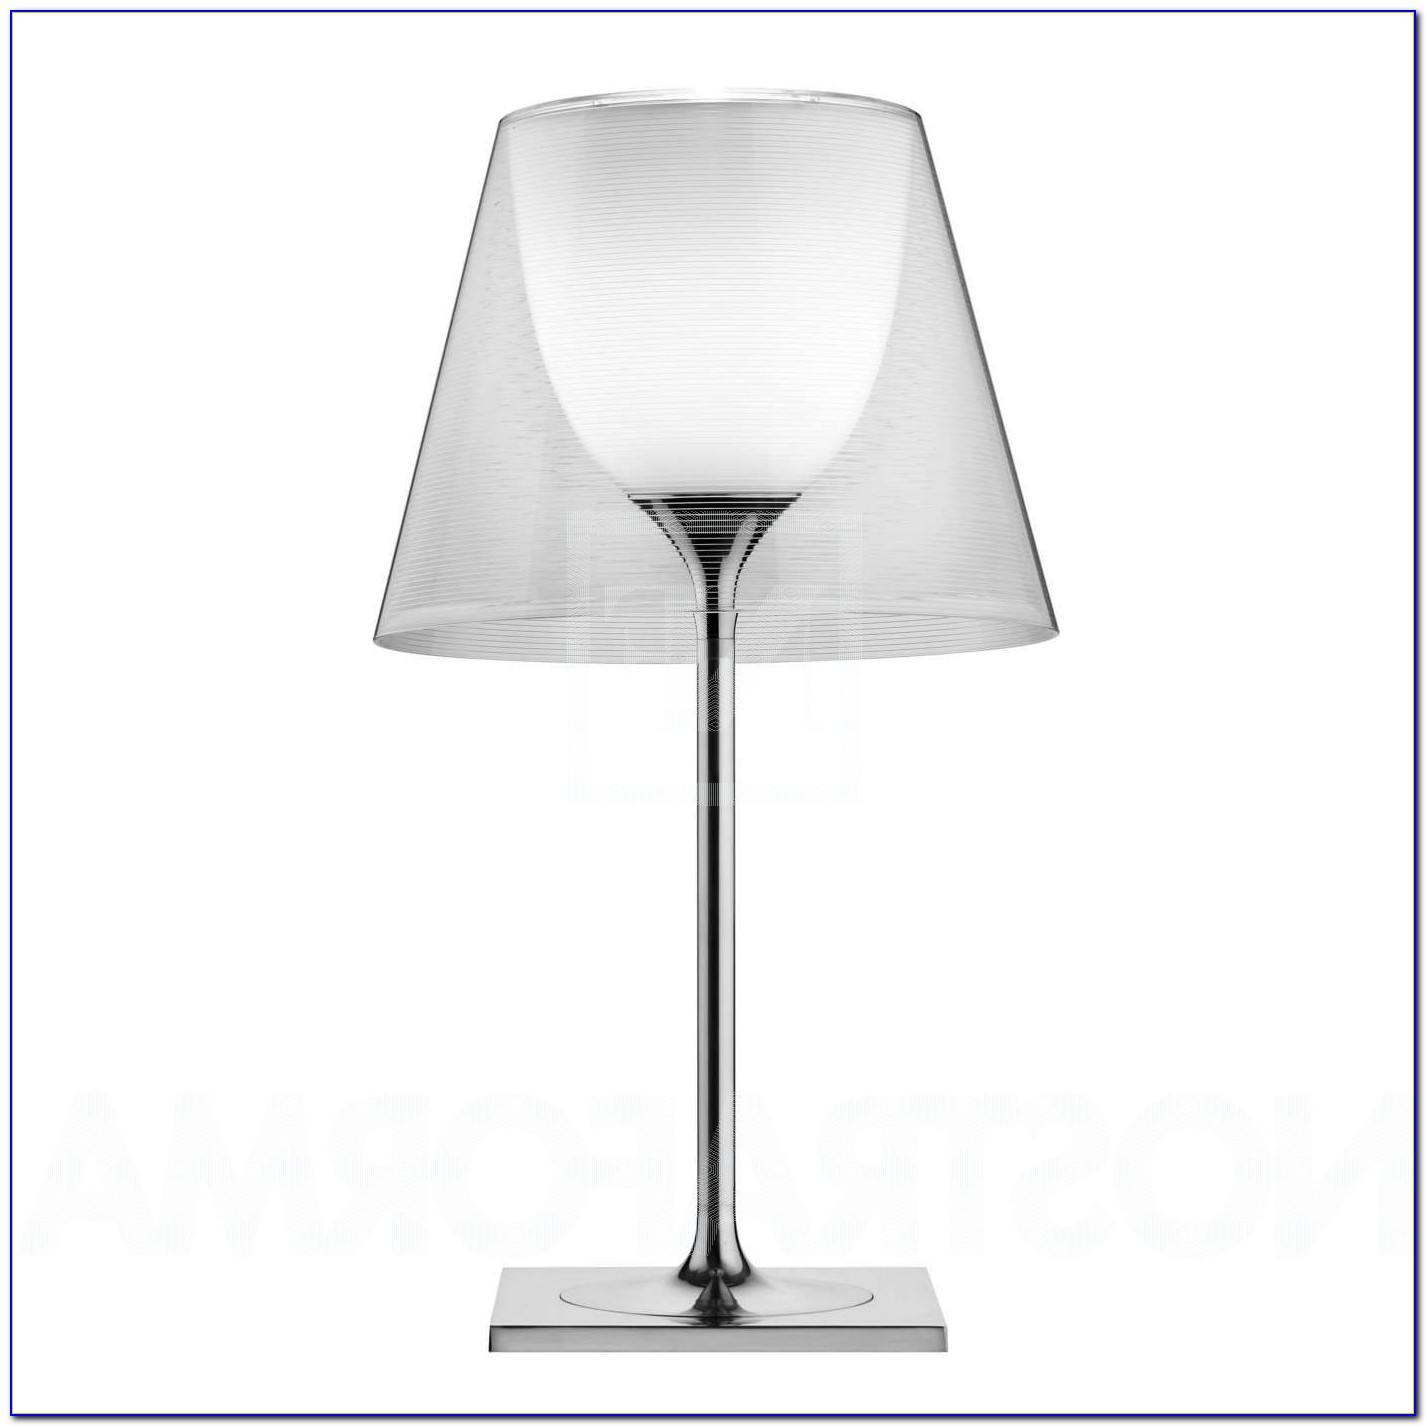 Amertac Tabletop Lamp Dimmer